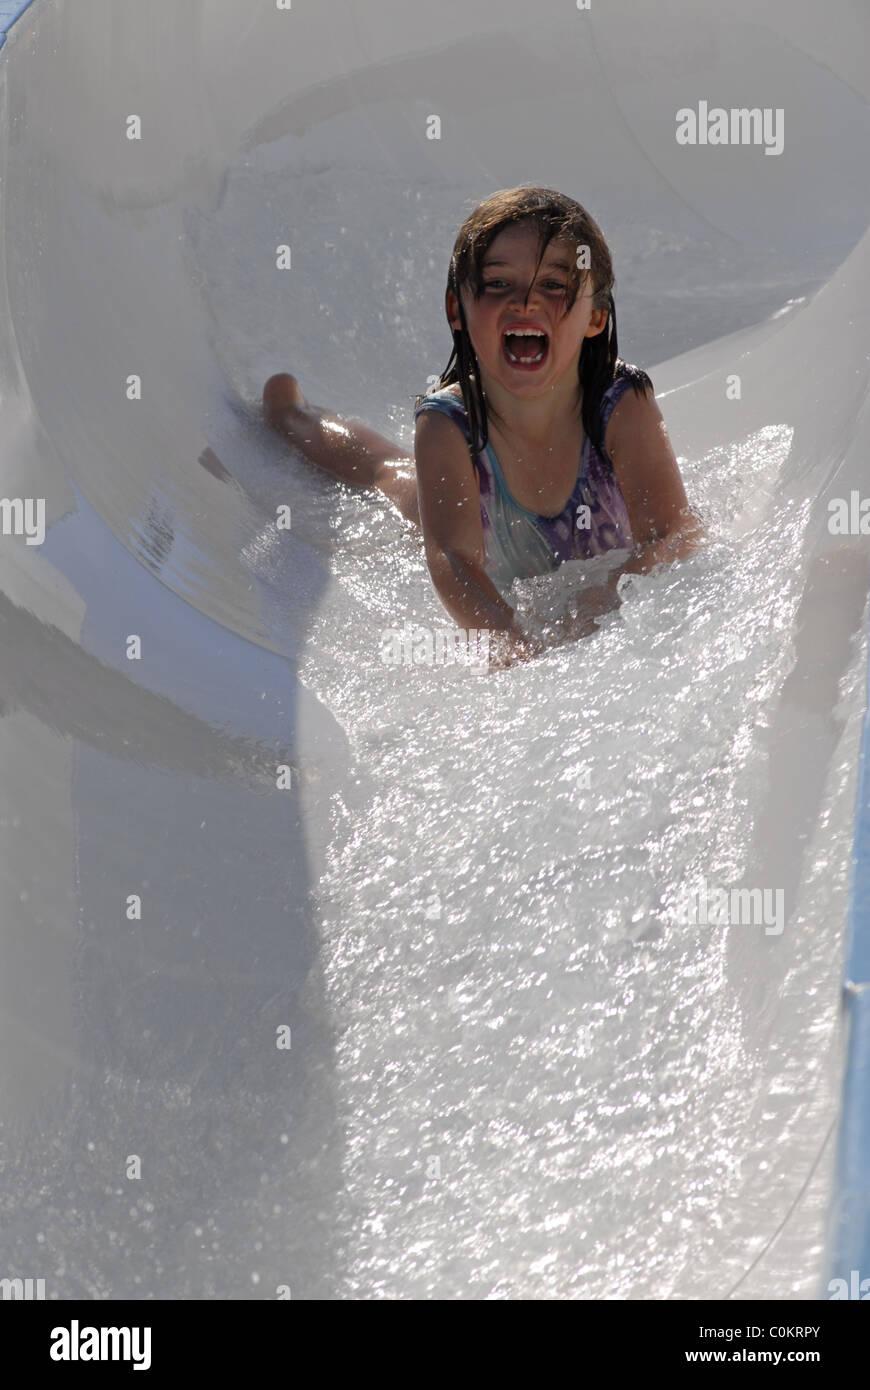 Little Girl Sliding Head First Down A Water Slide Stock